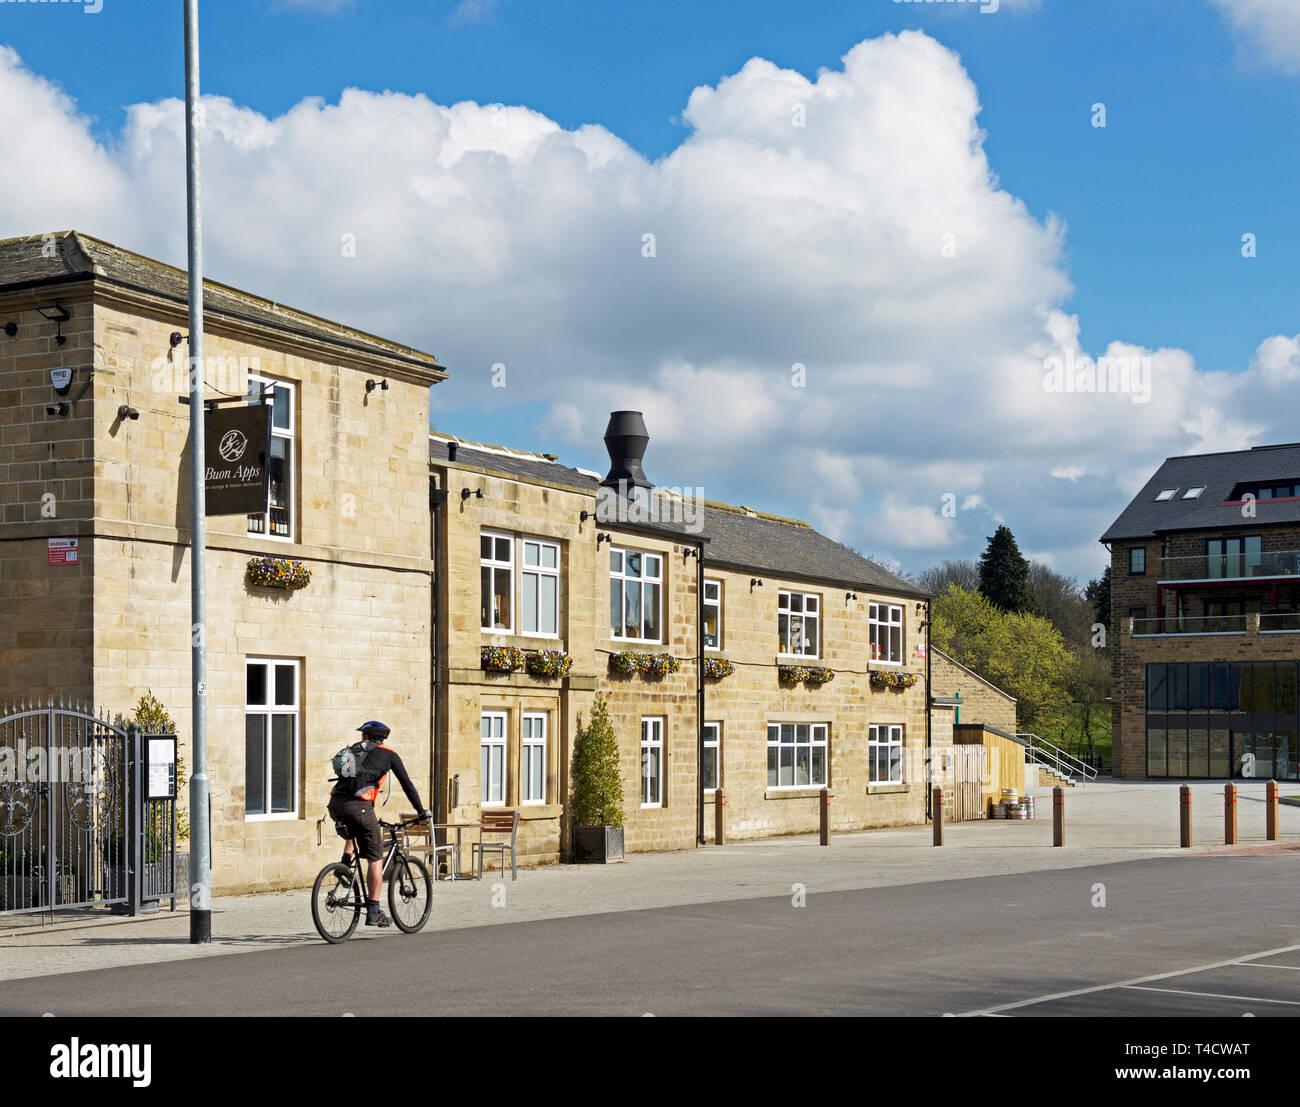 Buon Apps Restaurant Italien, Mill Lane, Otley, West Yorkshire, England UK Photo Stock